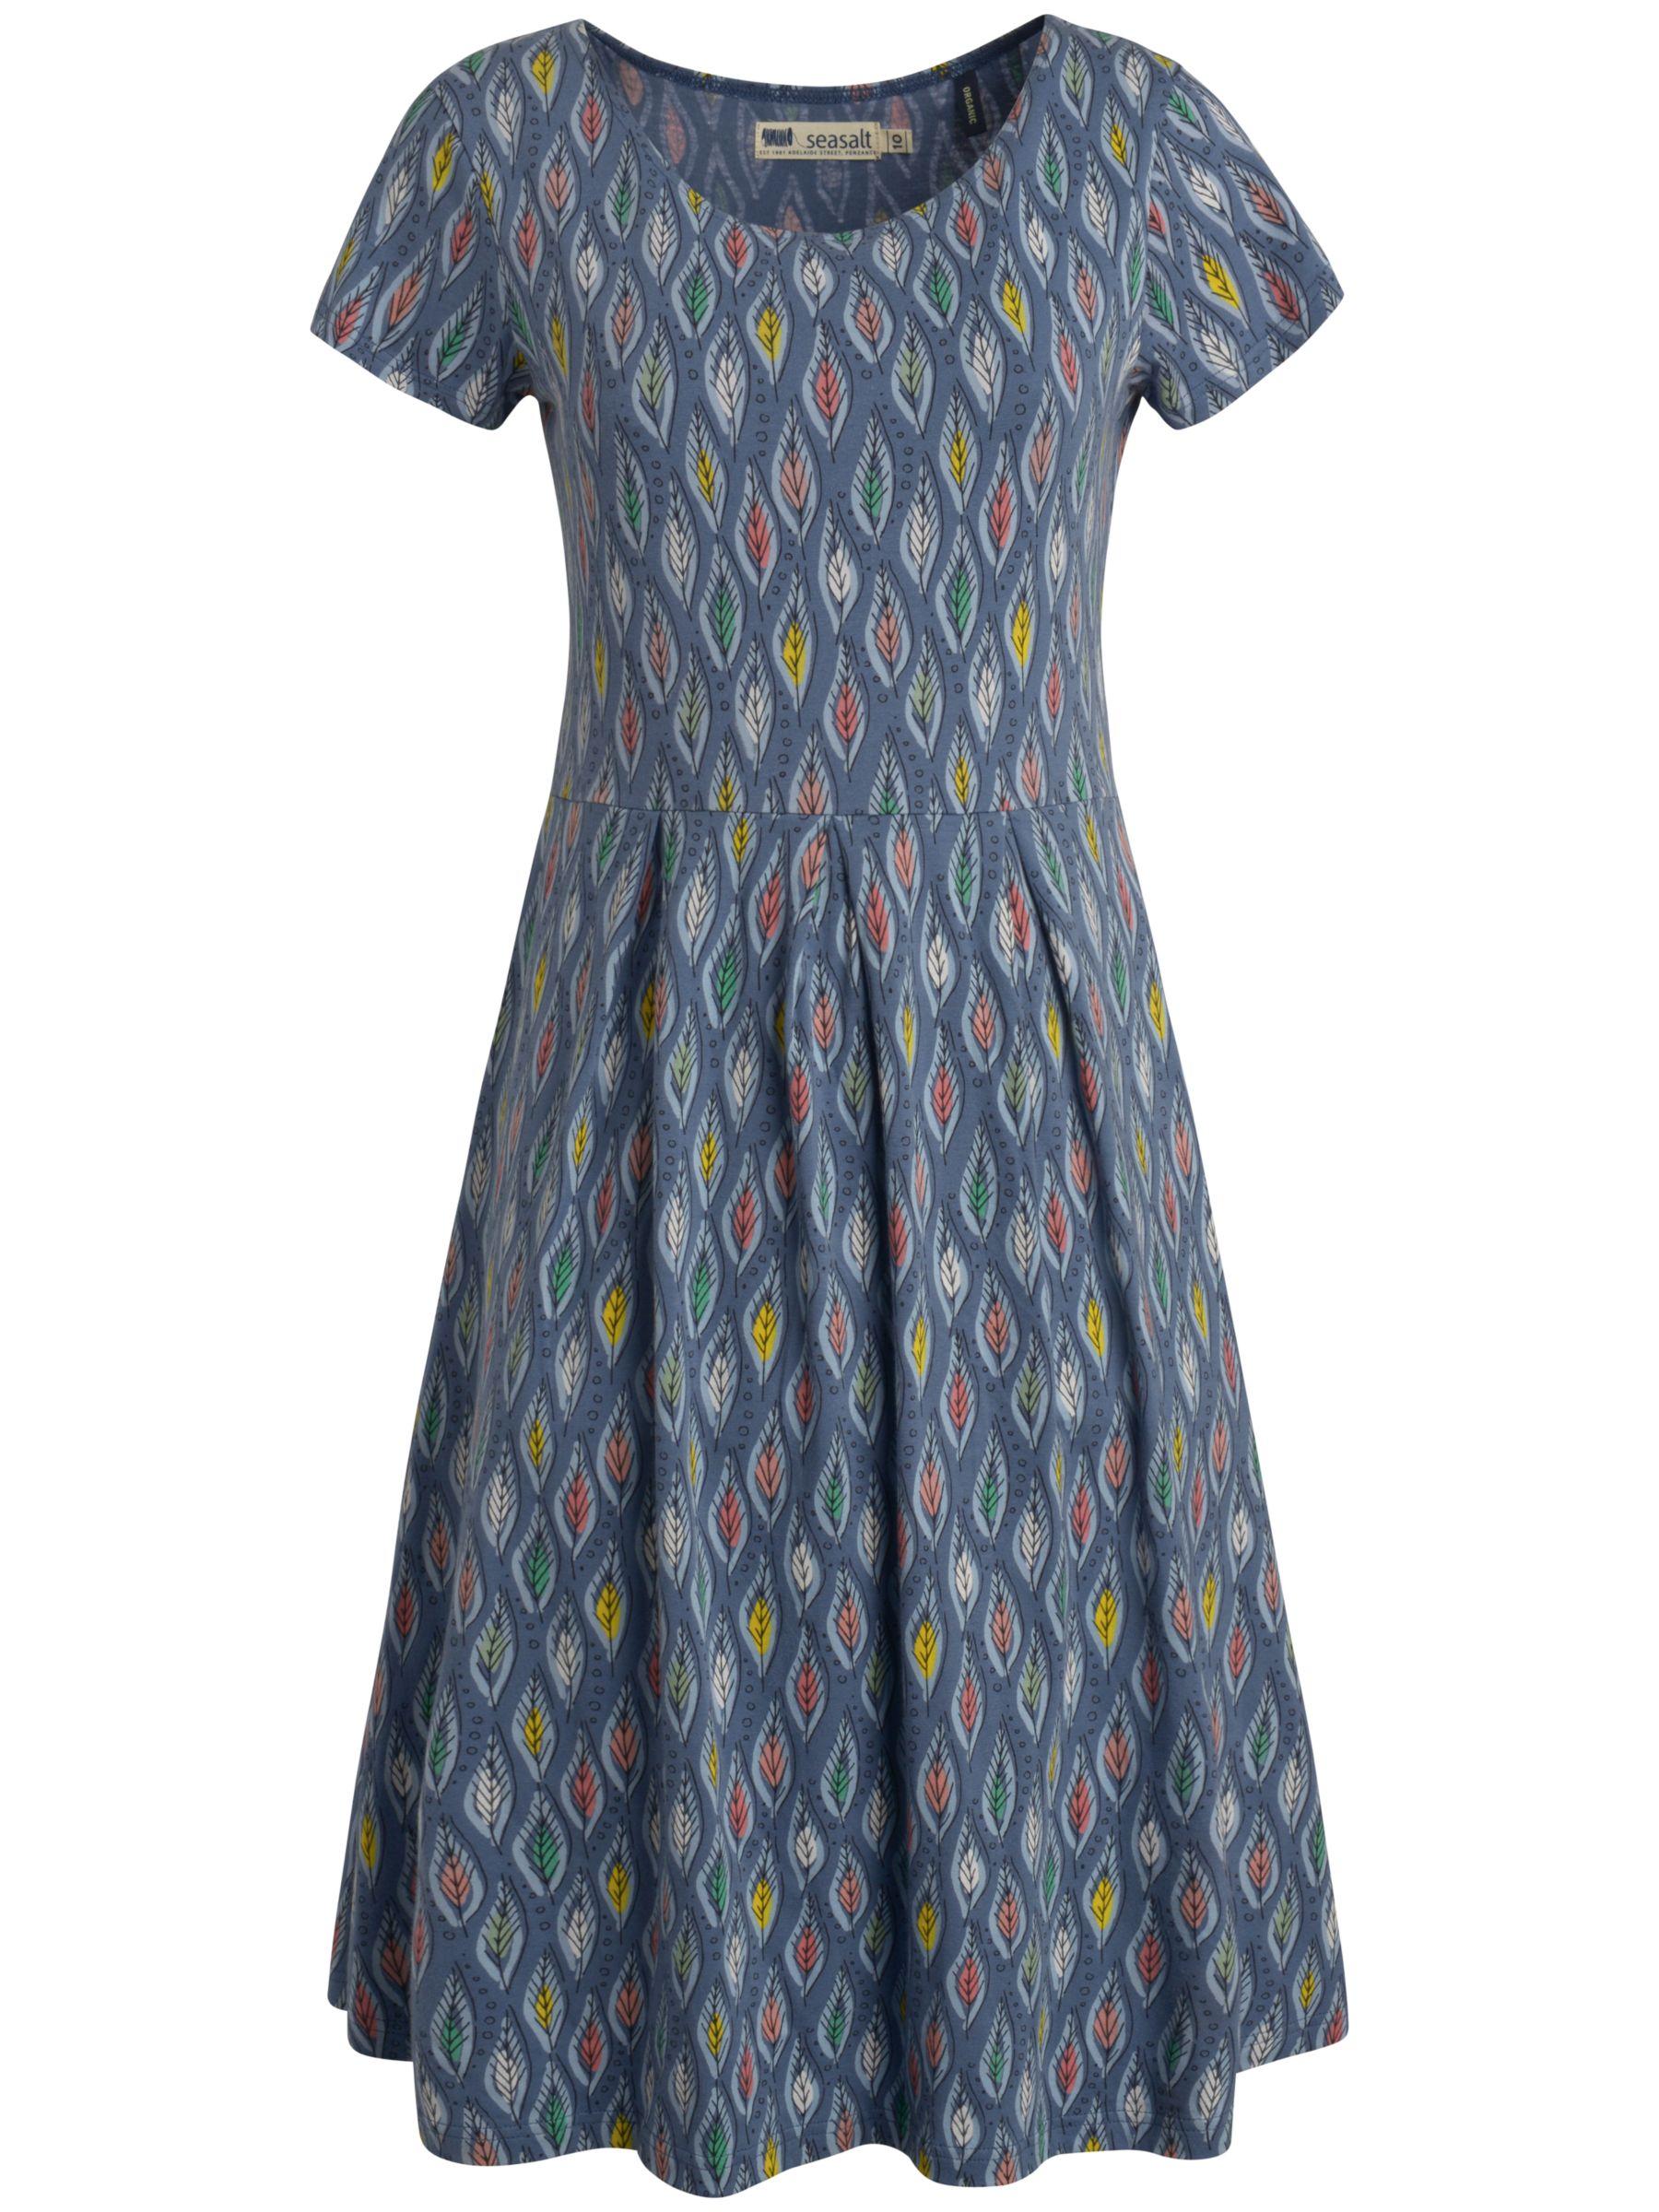 seasalt riviera dress drawn leaf borage, seasalt, riviera, dress, drawn, leaf, borage, 16|8|14|12|10, women, womens dresses, 1938202